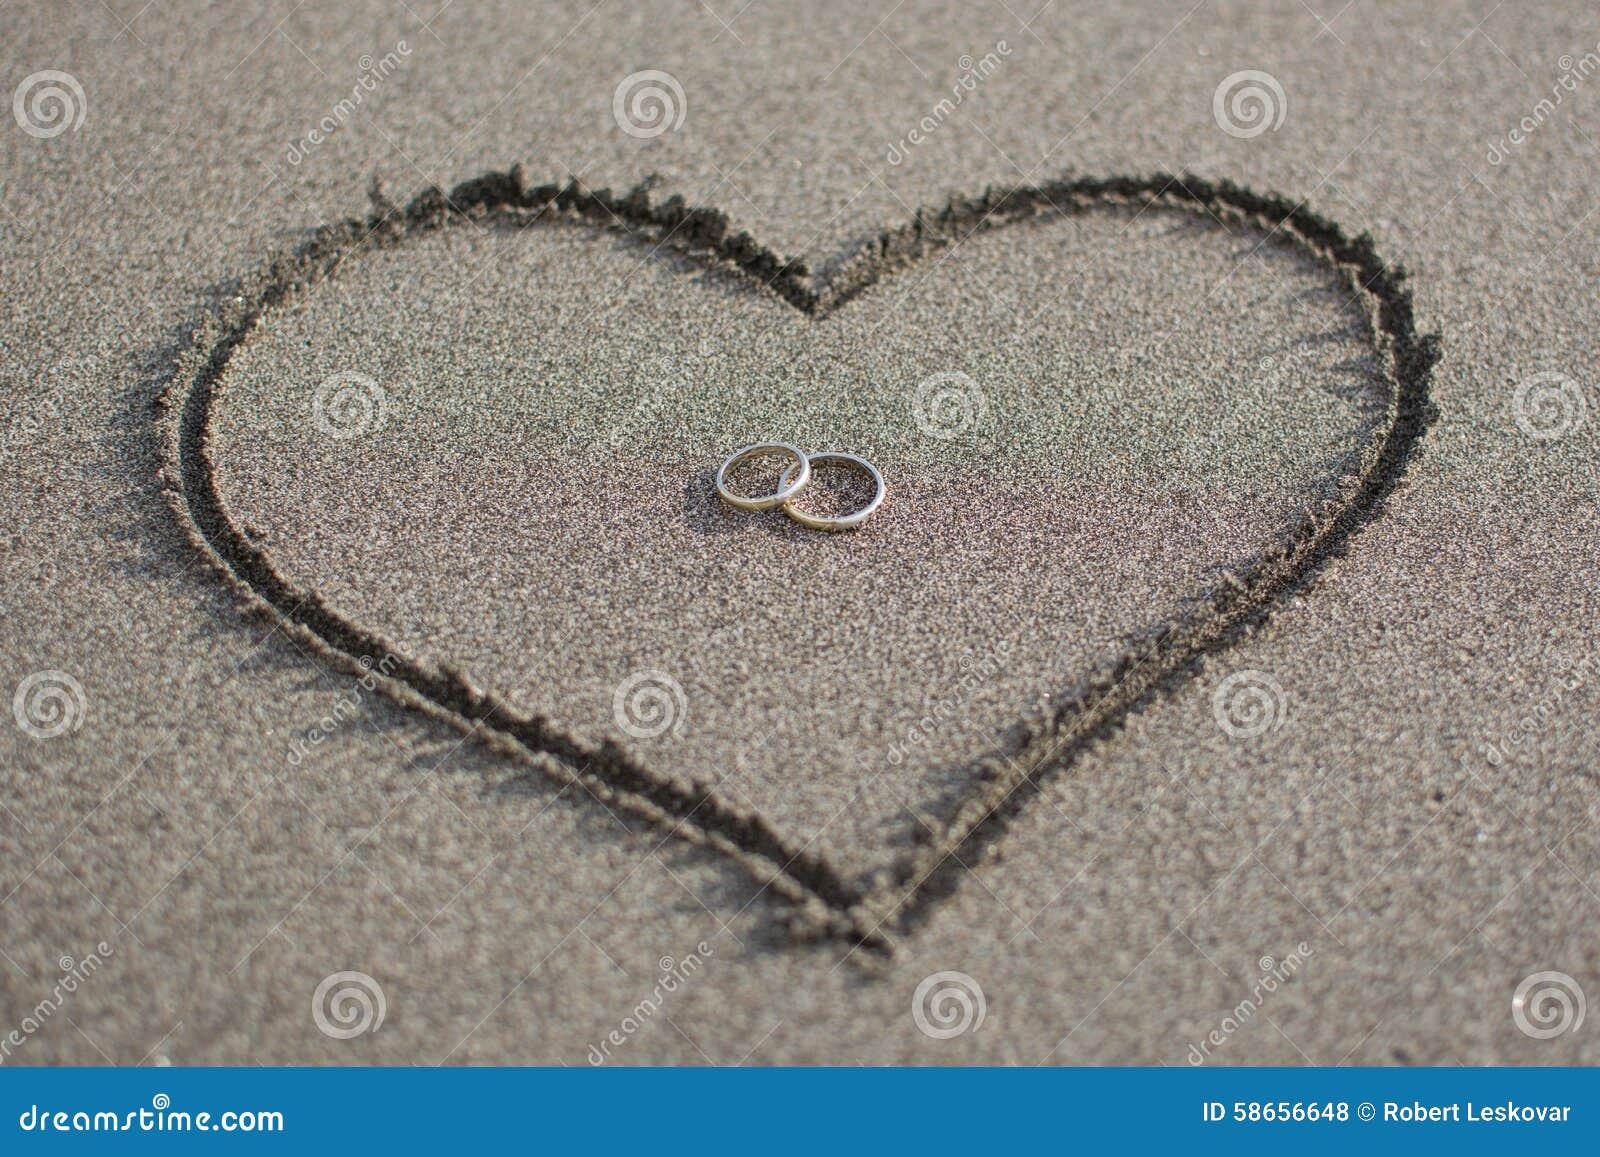 Love and wedding on the beach